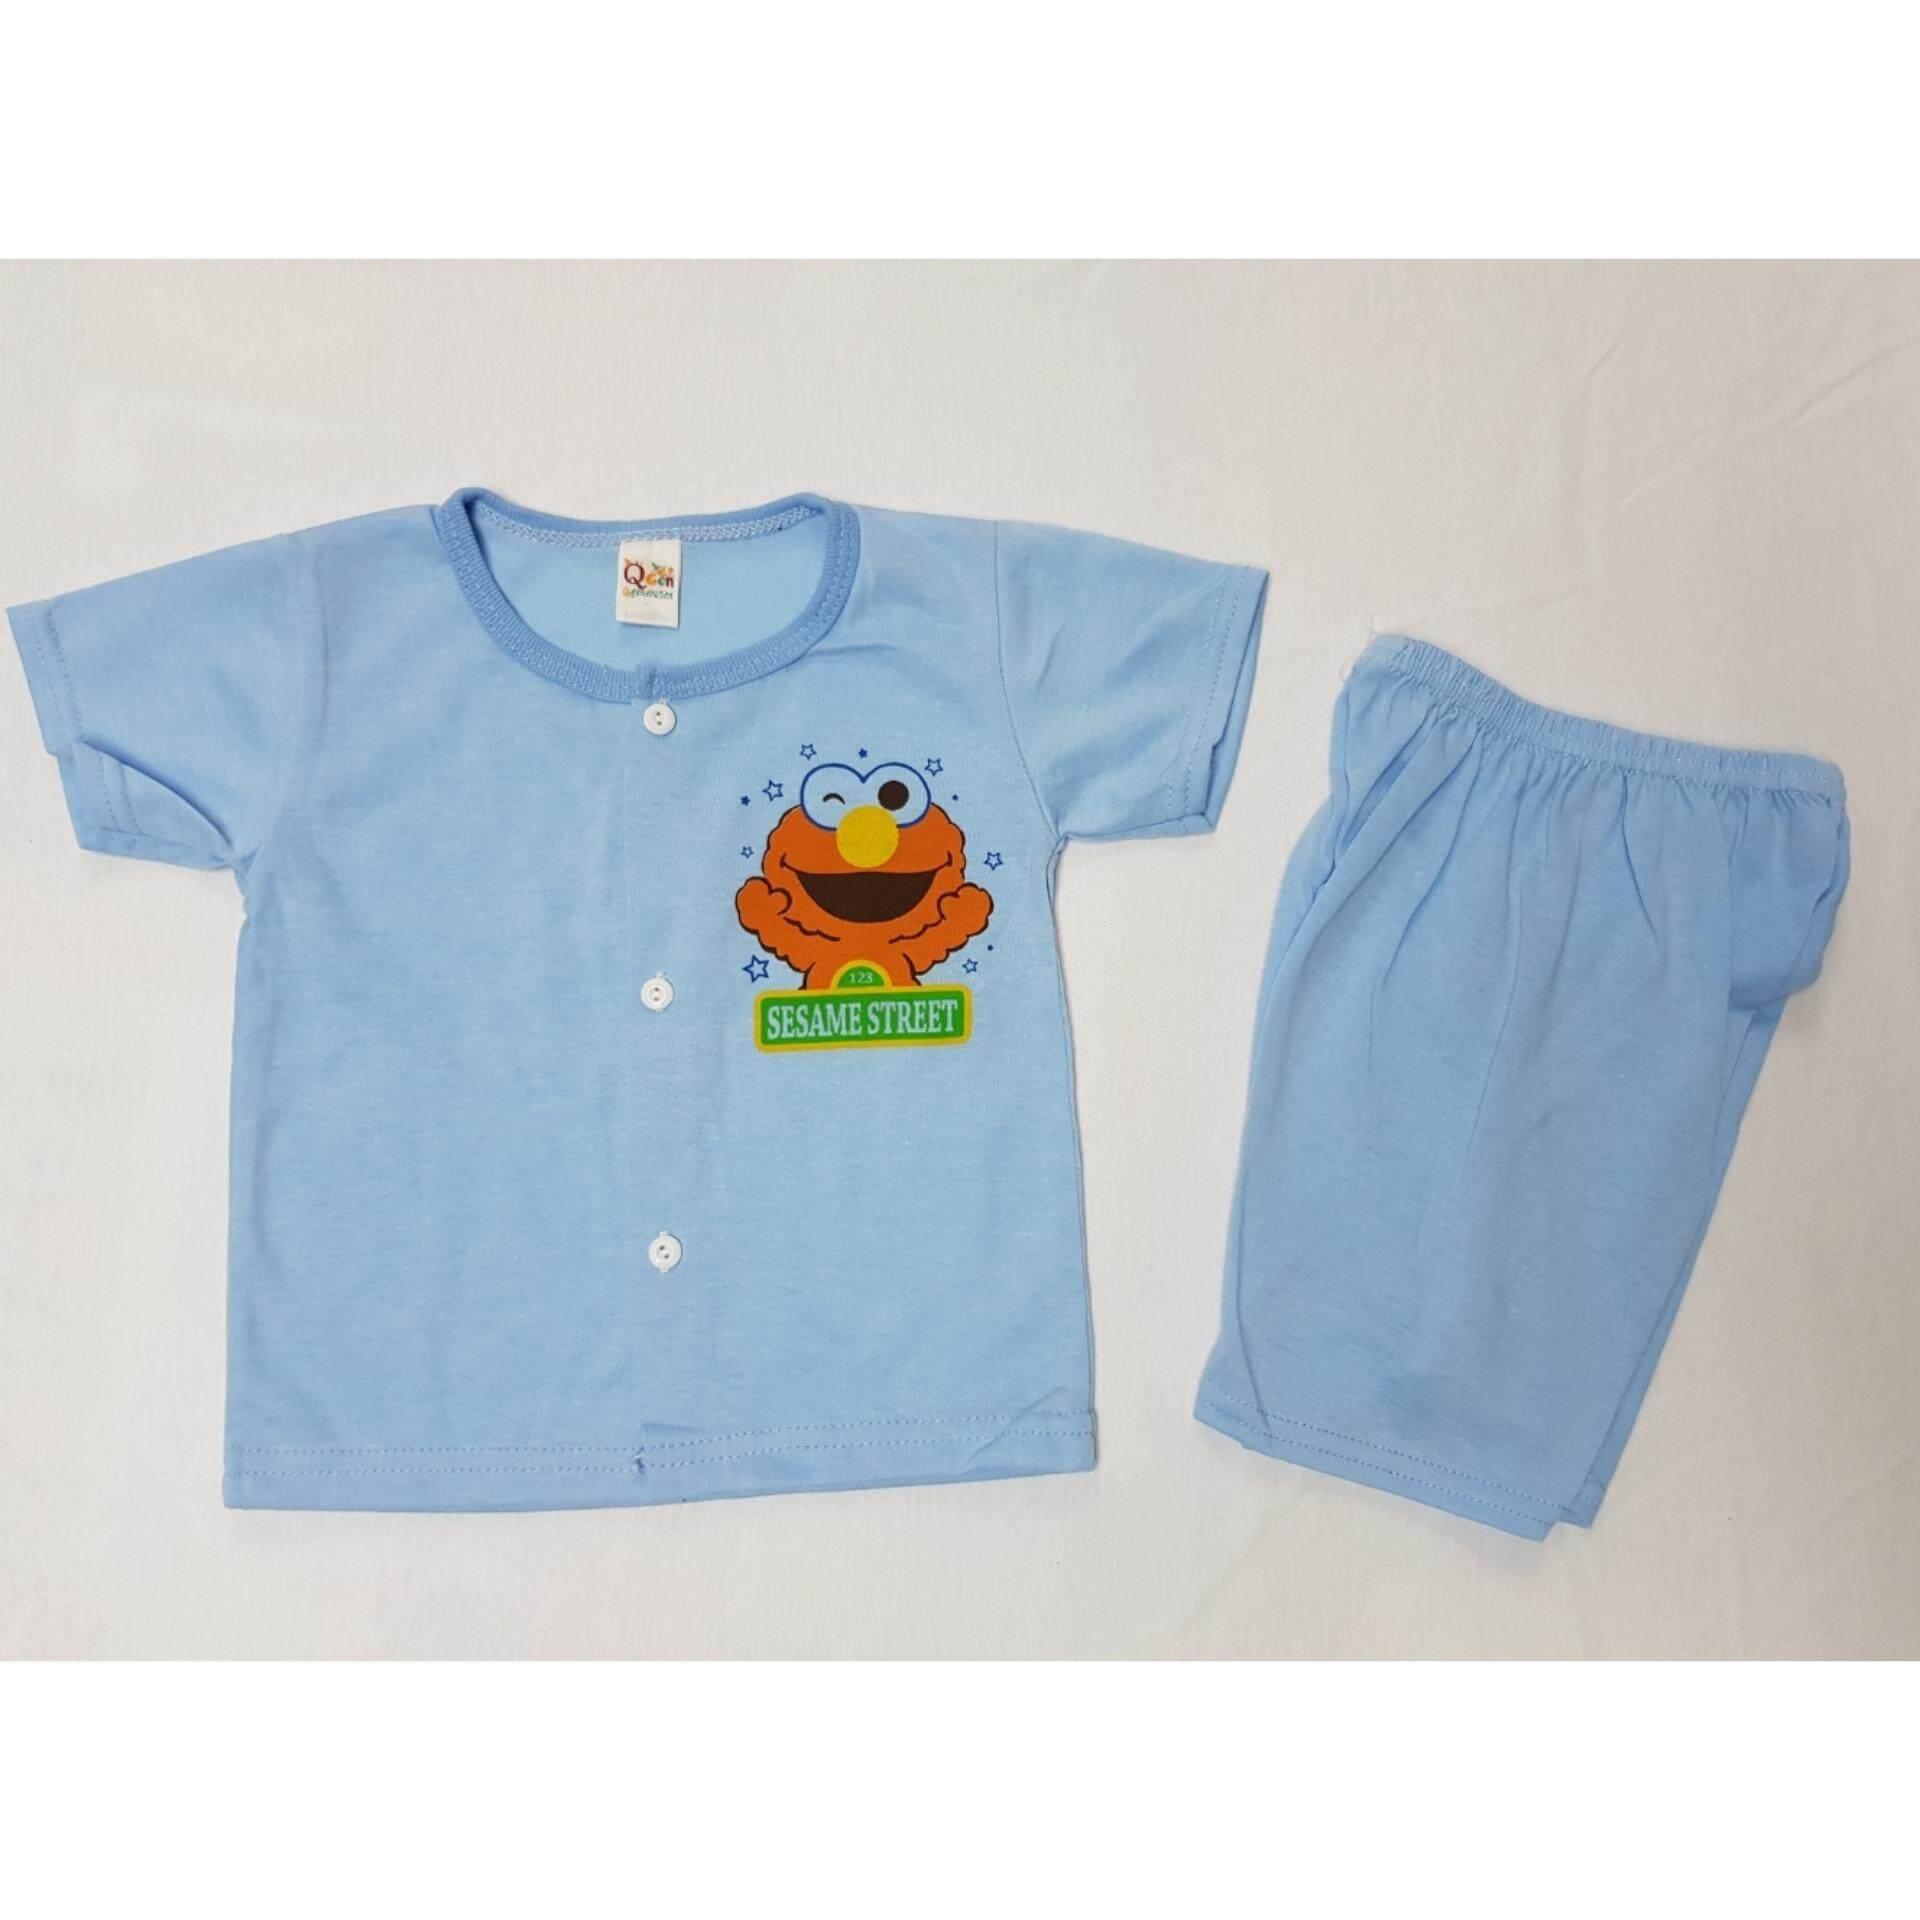 3 Pasang Elmo Sesame Street NewBorn Baby Casual wear